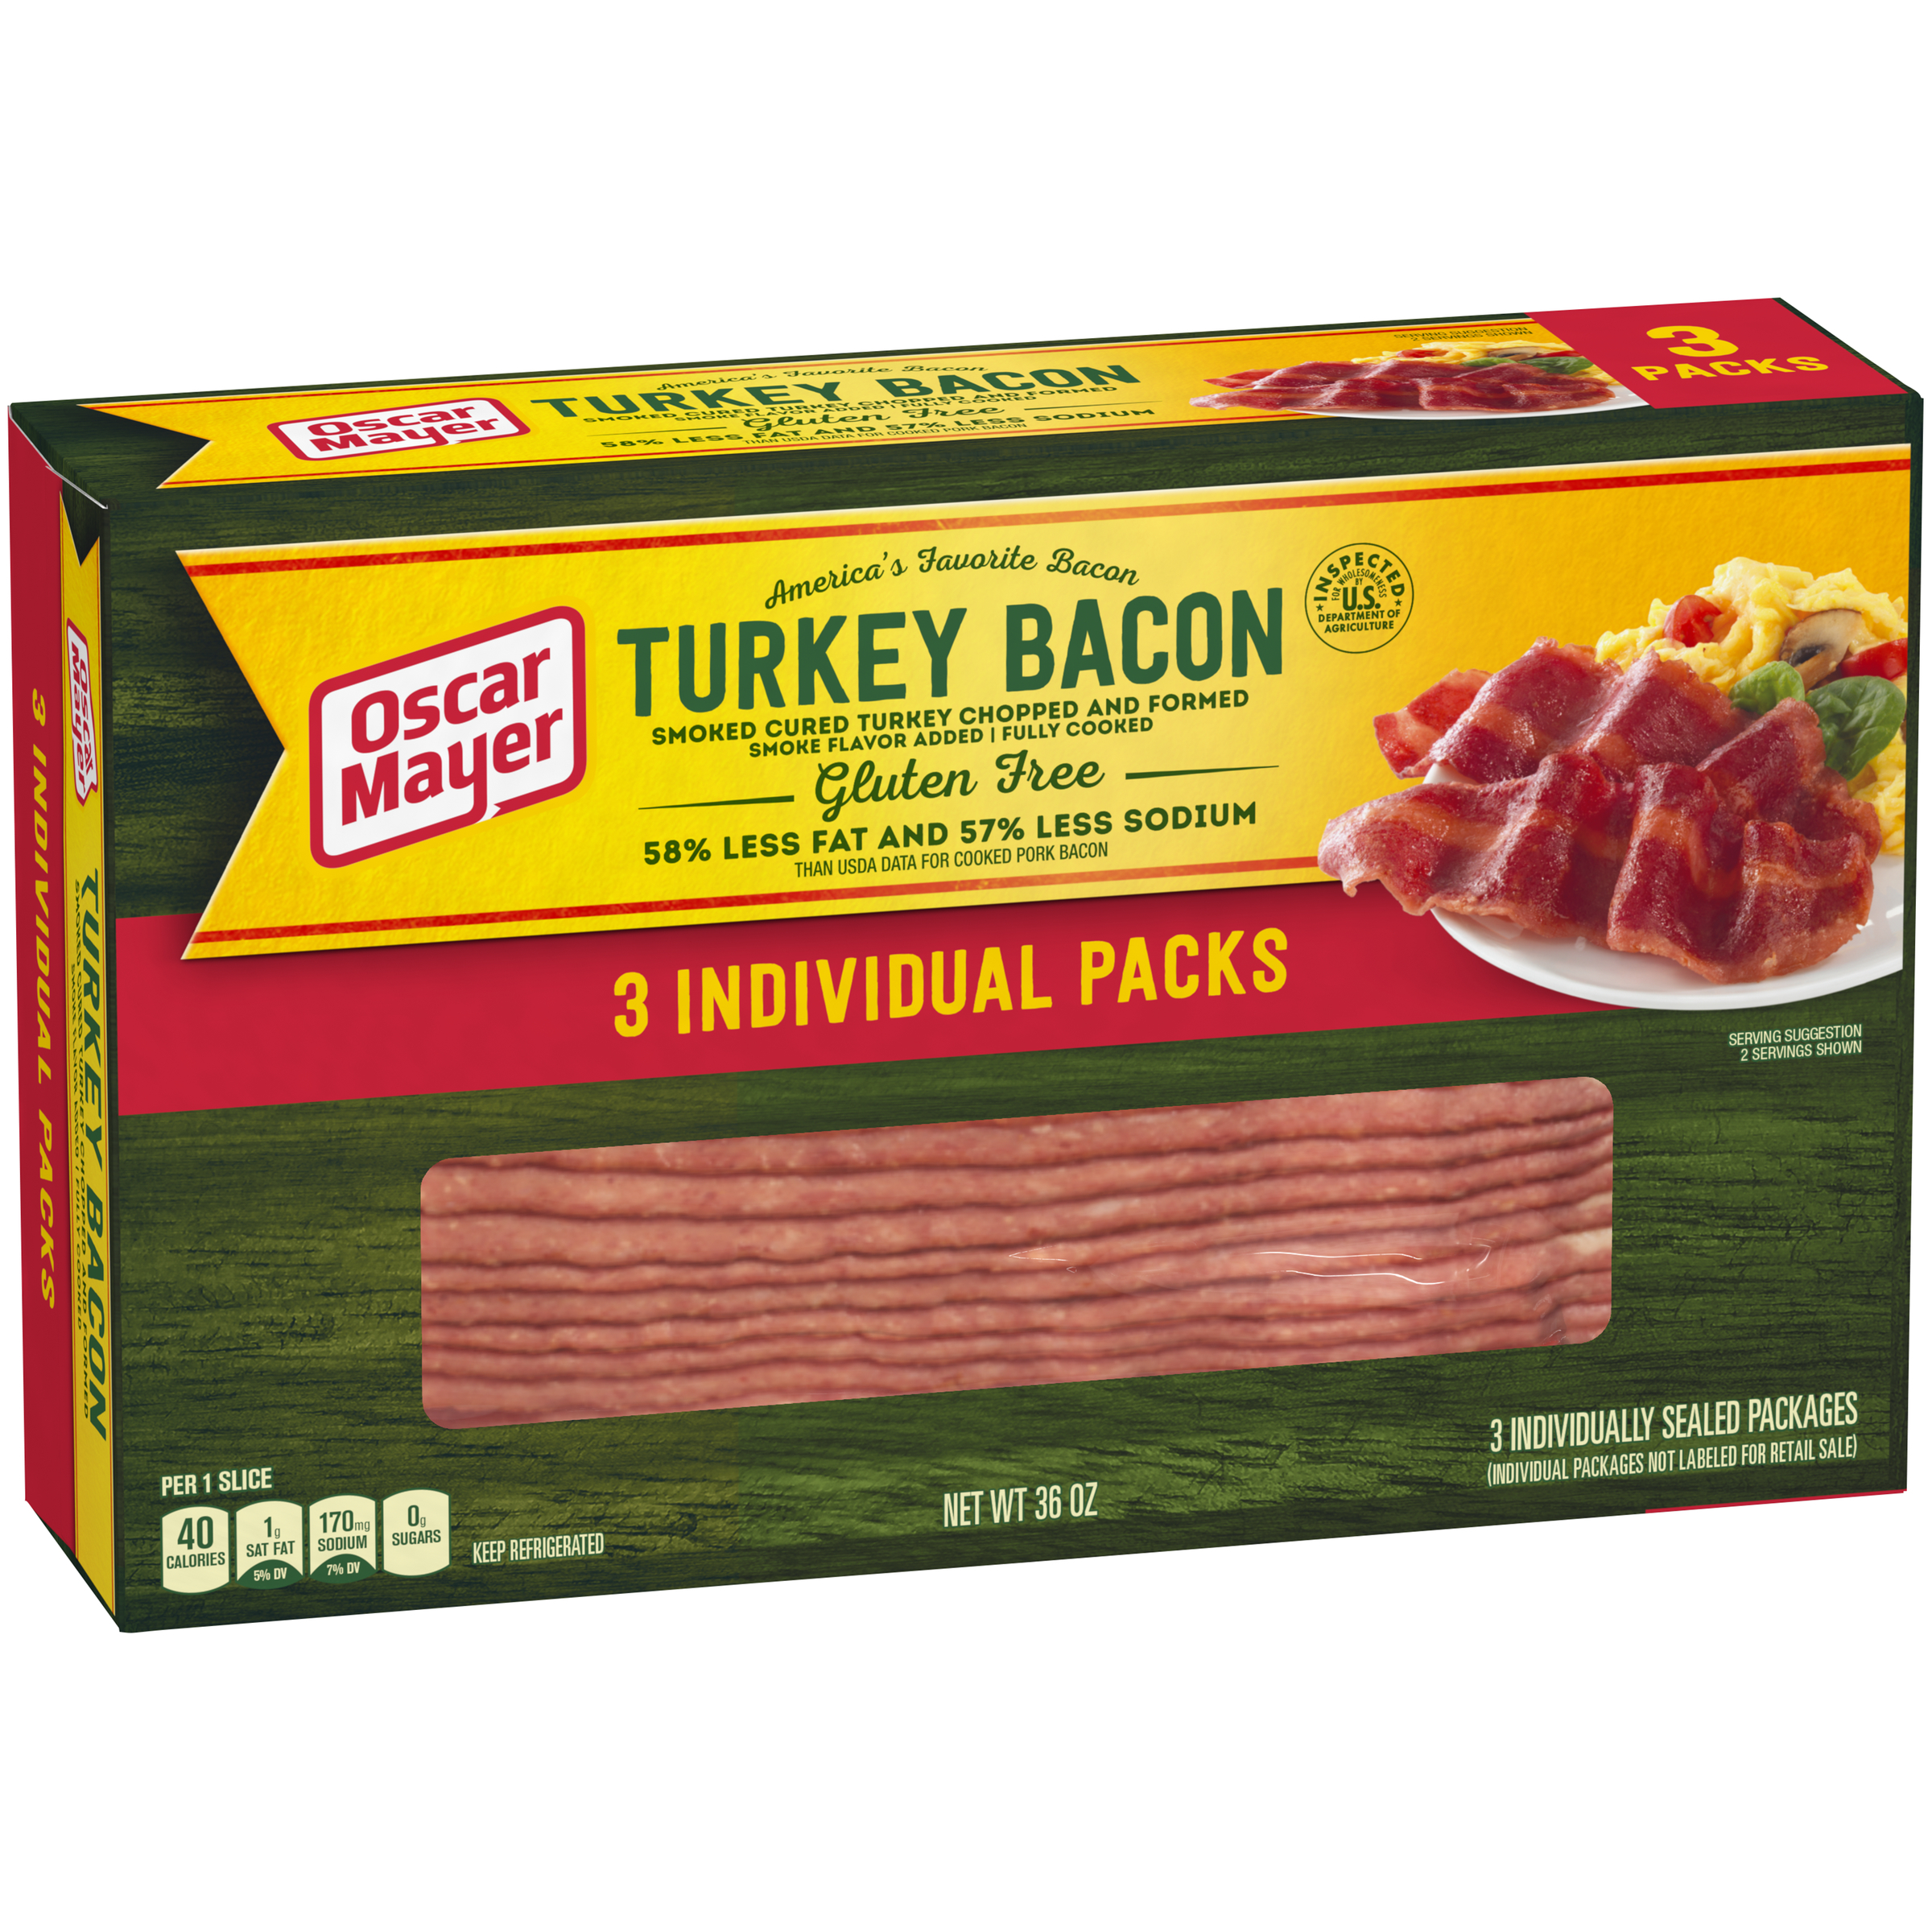 Oscar Mayer Turkey Bacon, 36 Oz.